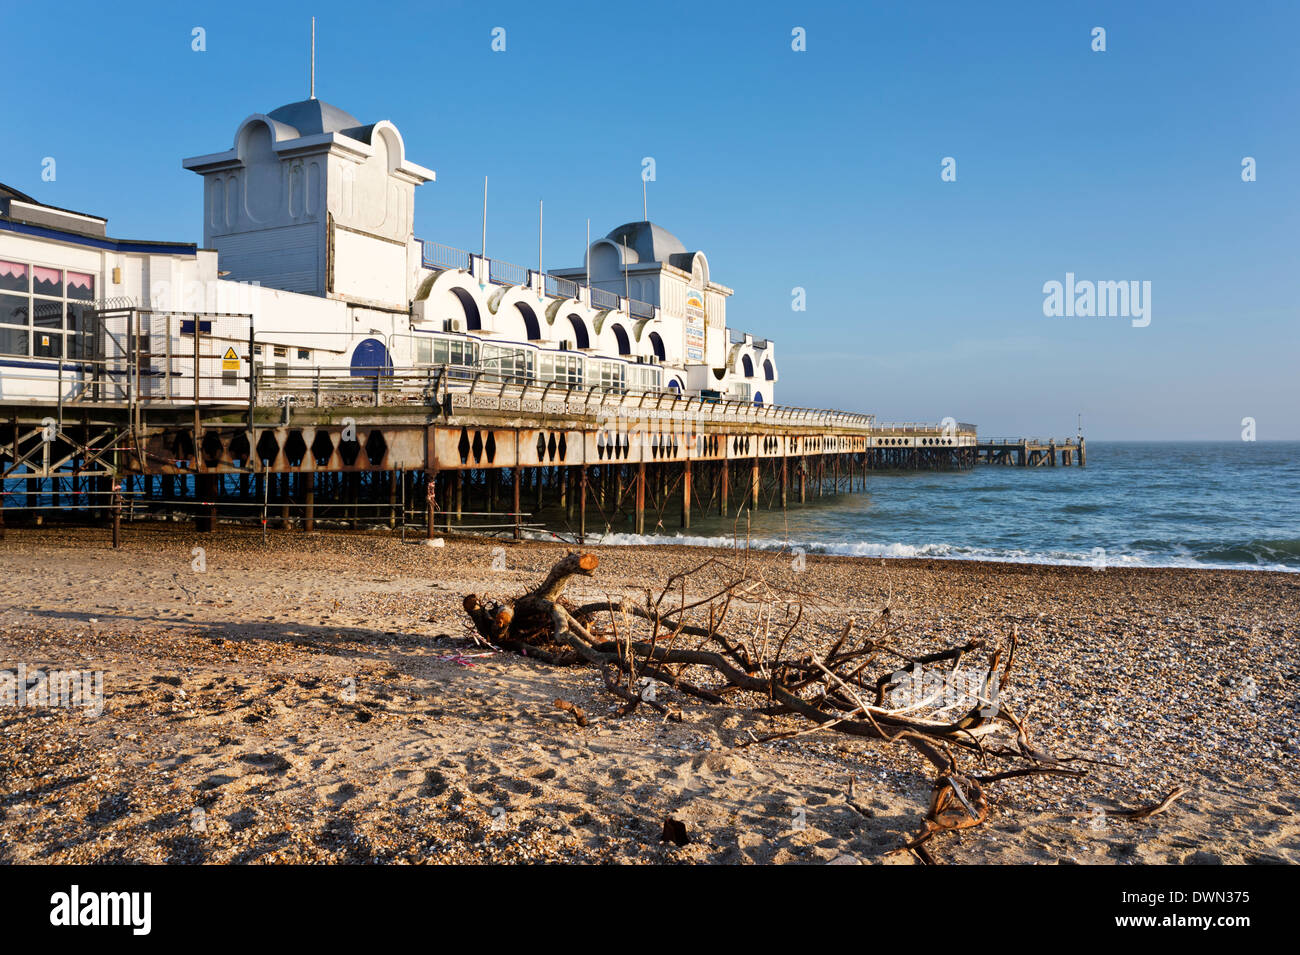 South Parade Pier, Southsea, Hampshire, UK - Stock Image